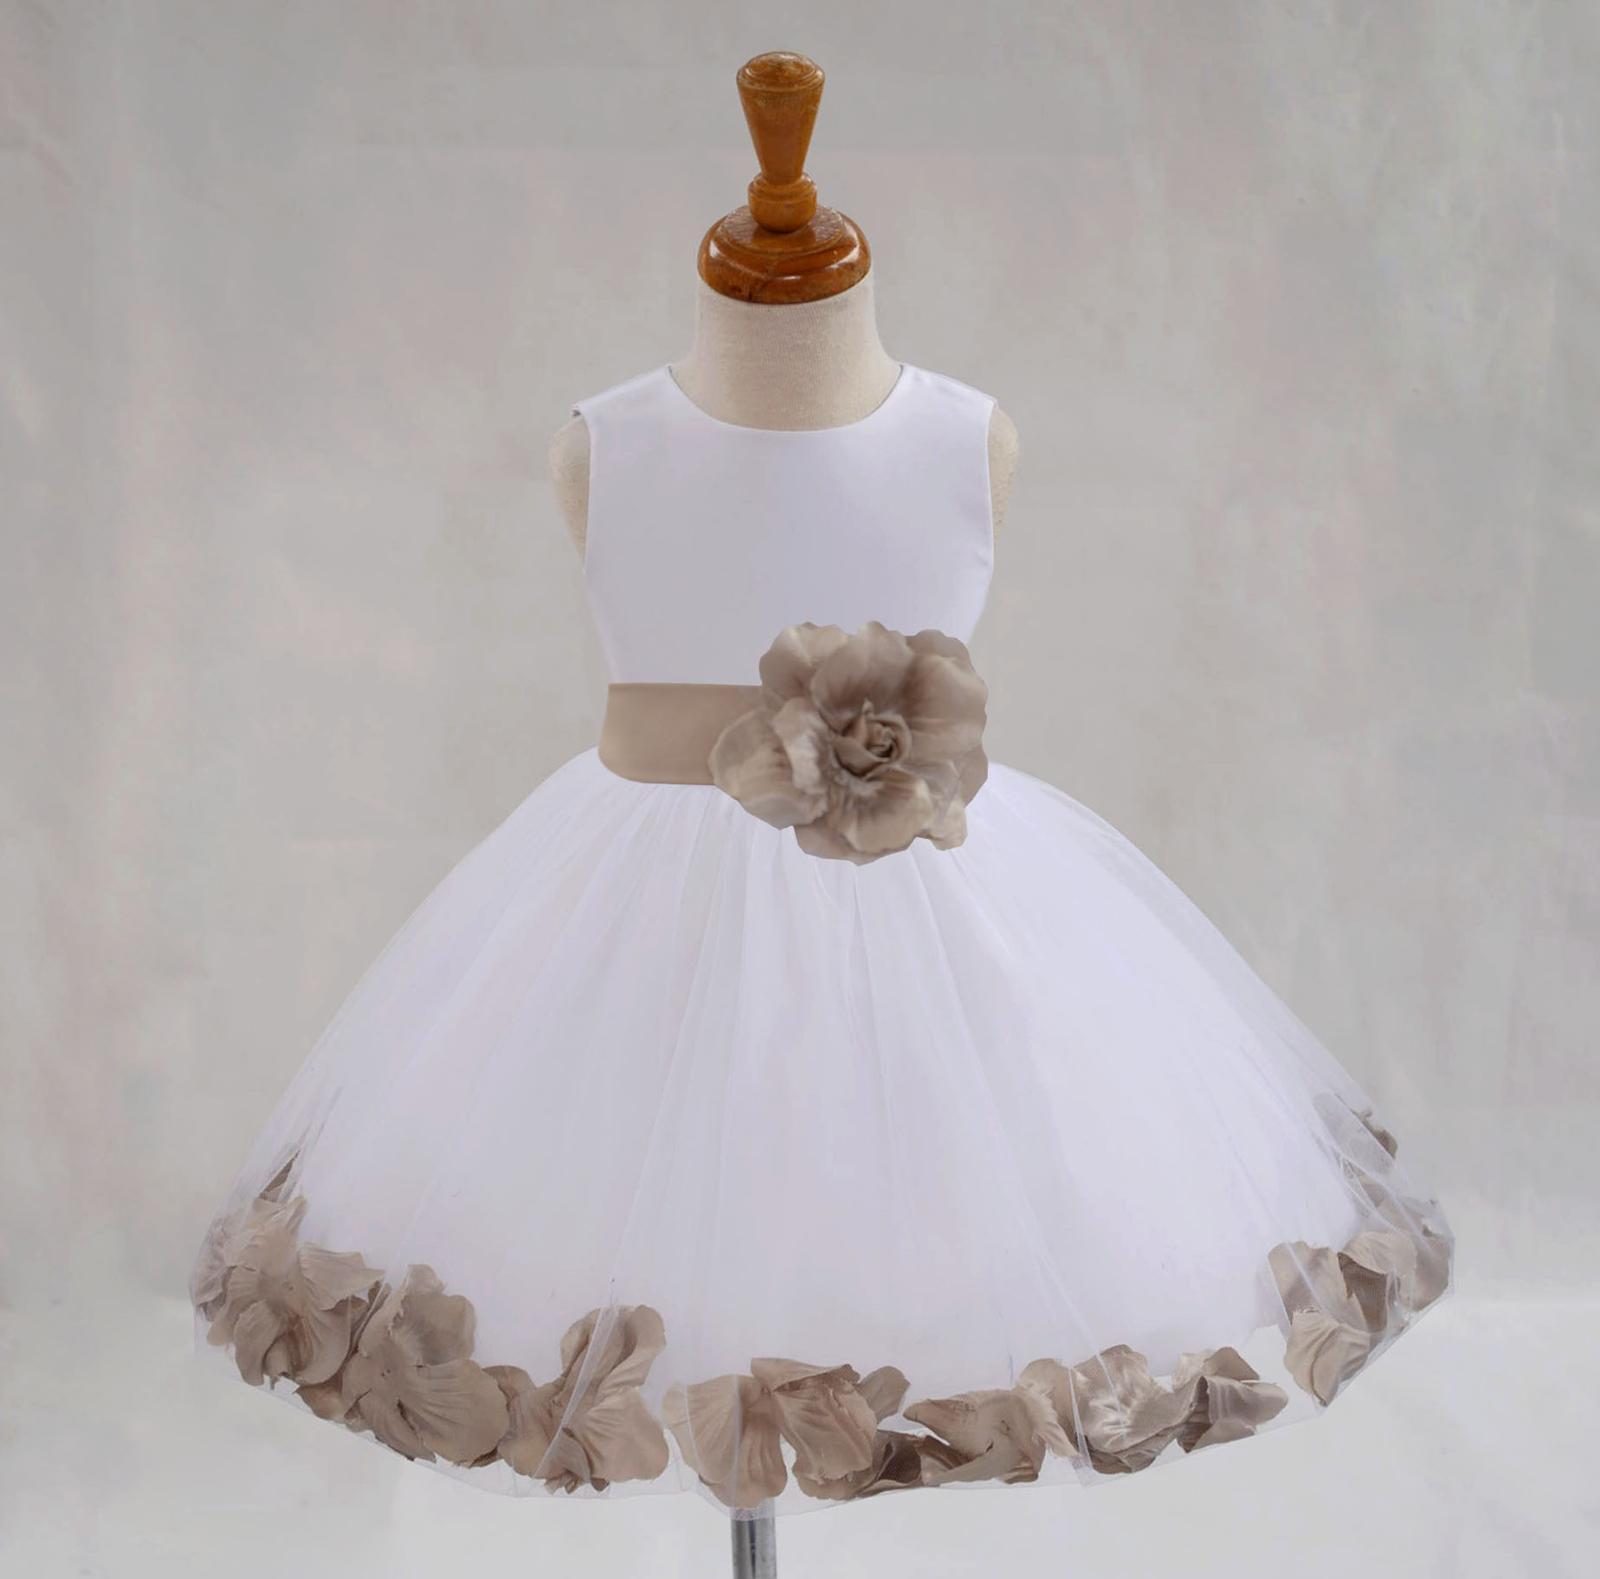 2695bef194f5 Beige Ekidsbridal Girls  Dresses - Sears